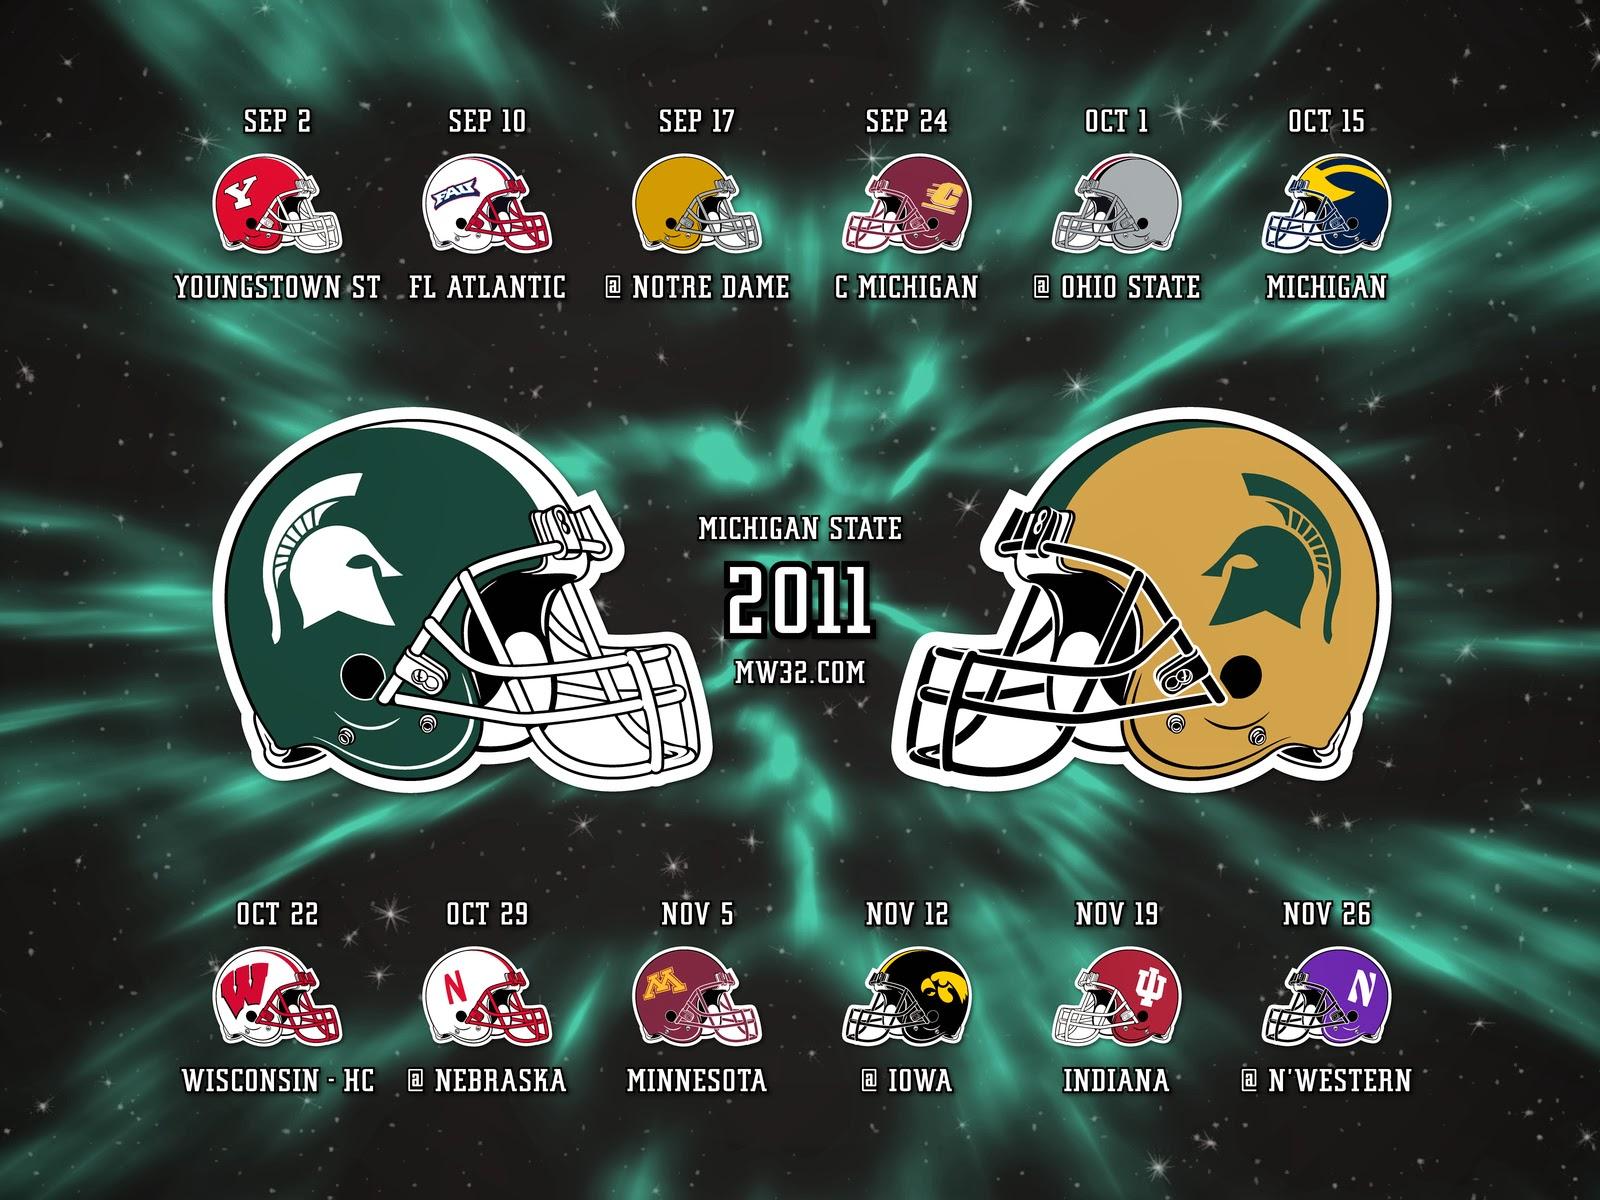 msu football wallpaper beautiful desktop wallpapers 2014